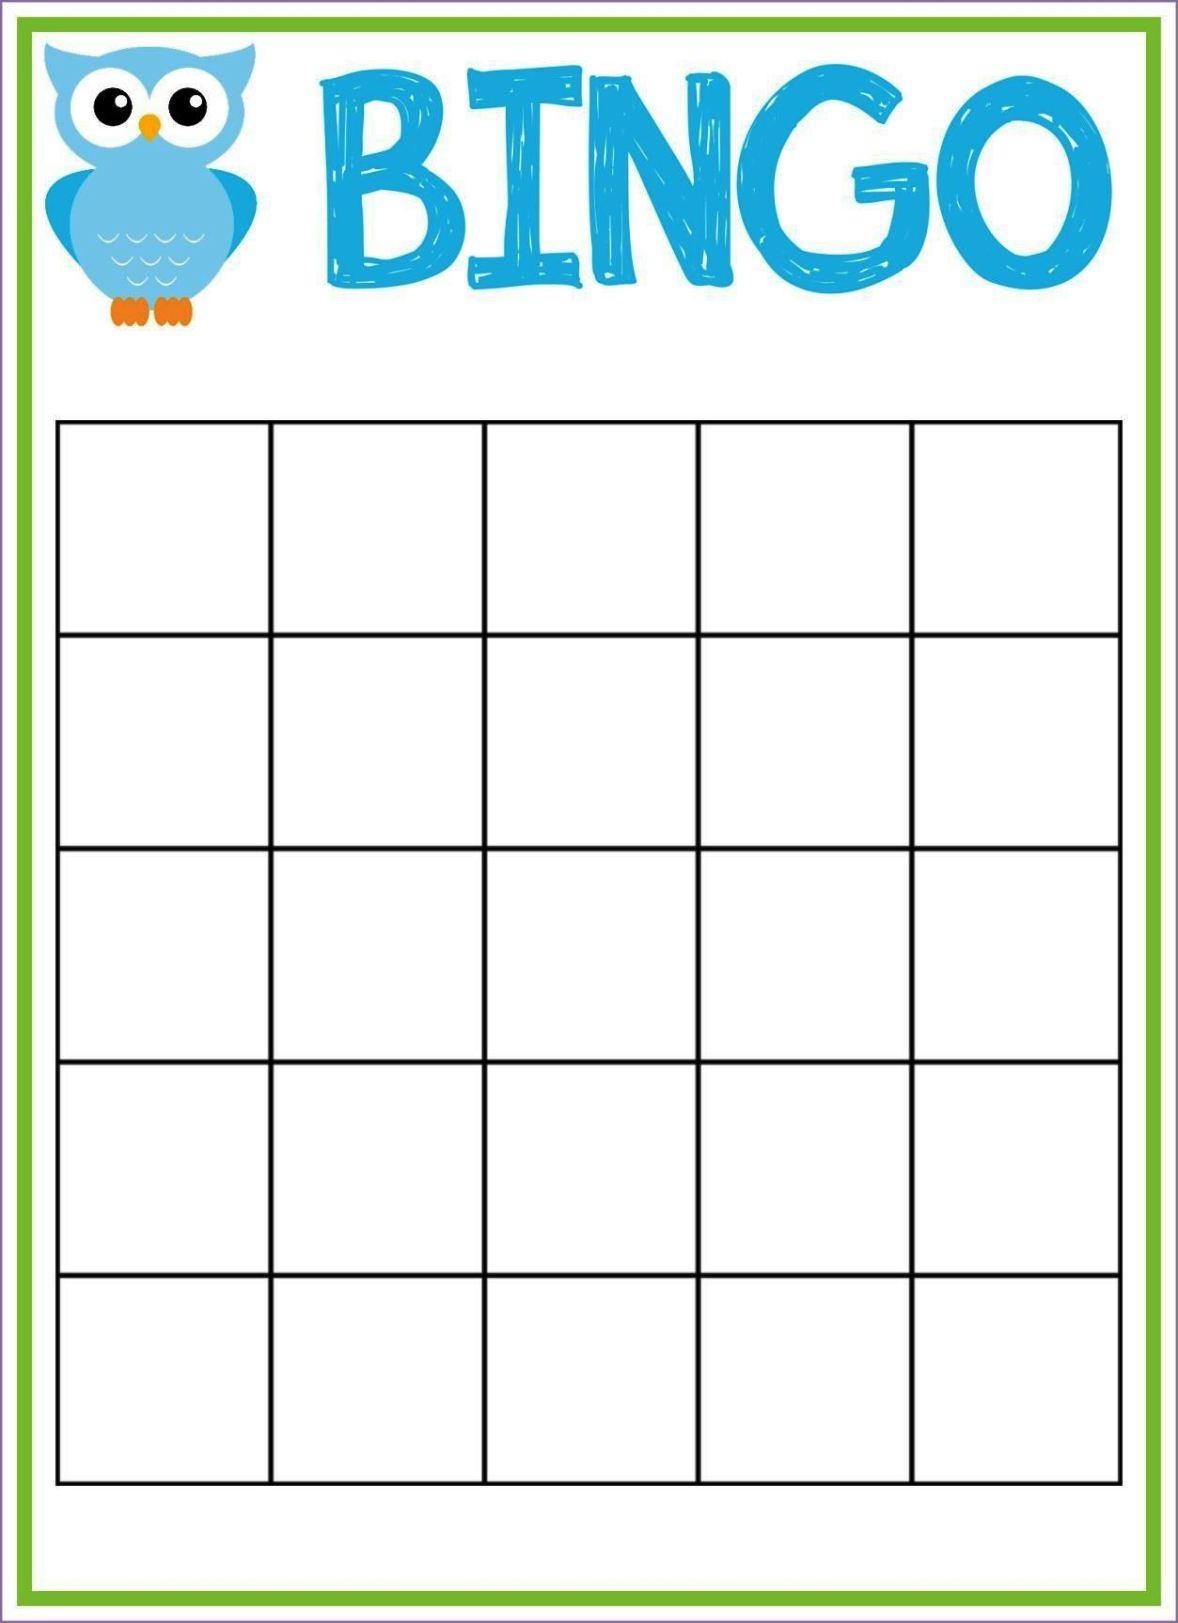 Bingo-Sheet-Template Teacher Letter Template on